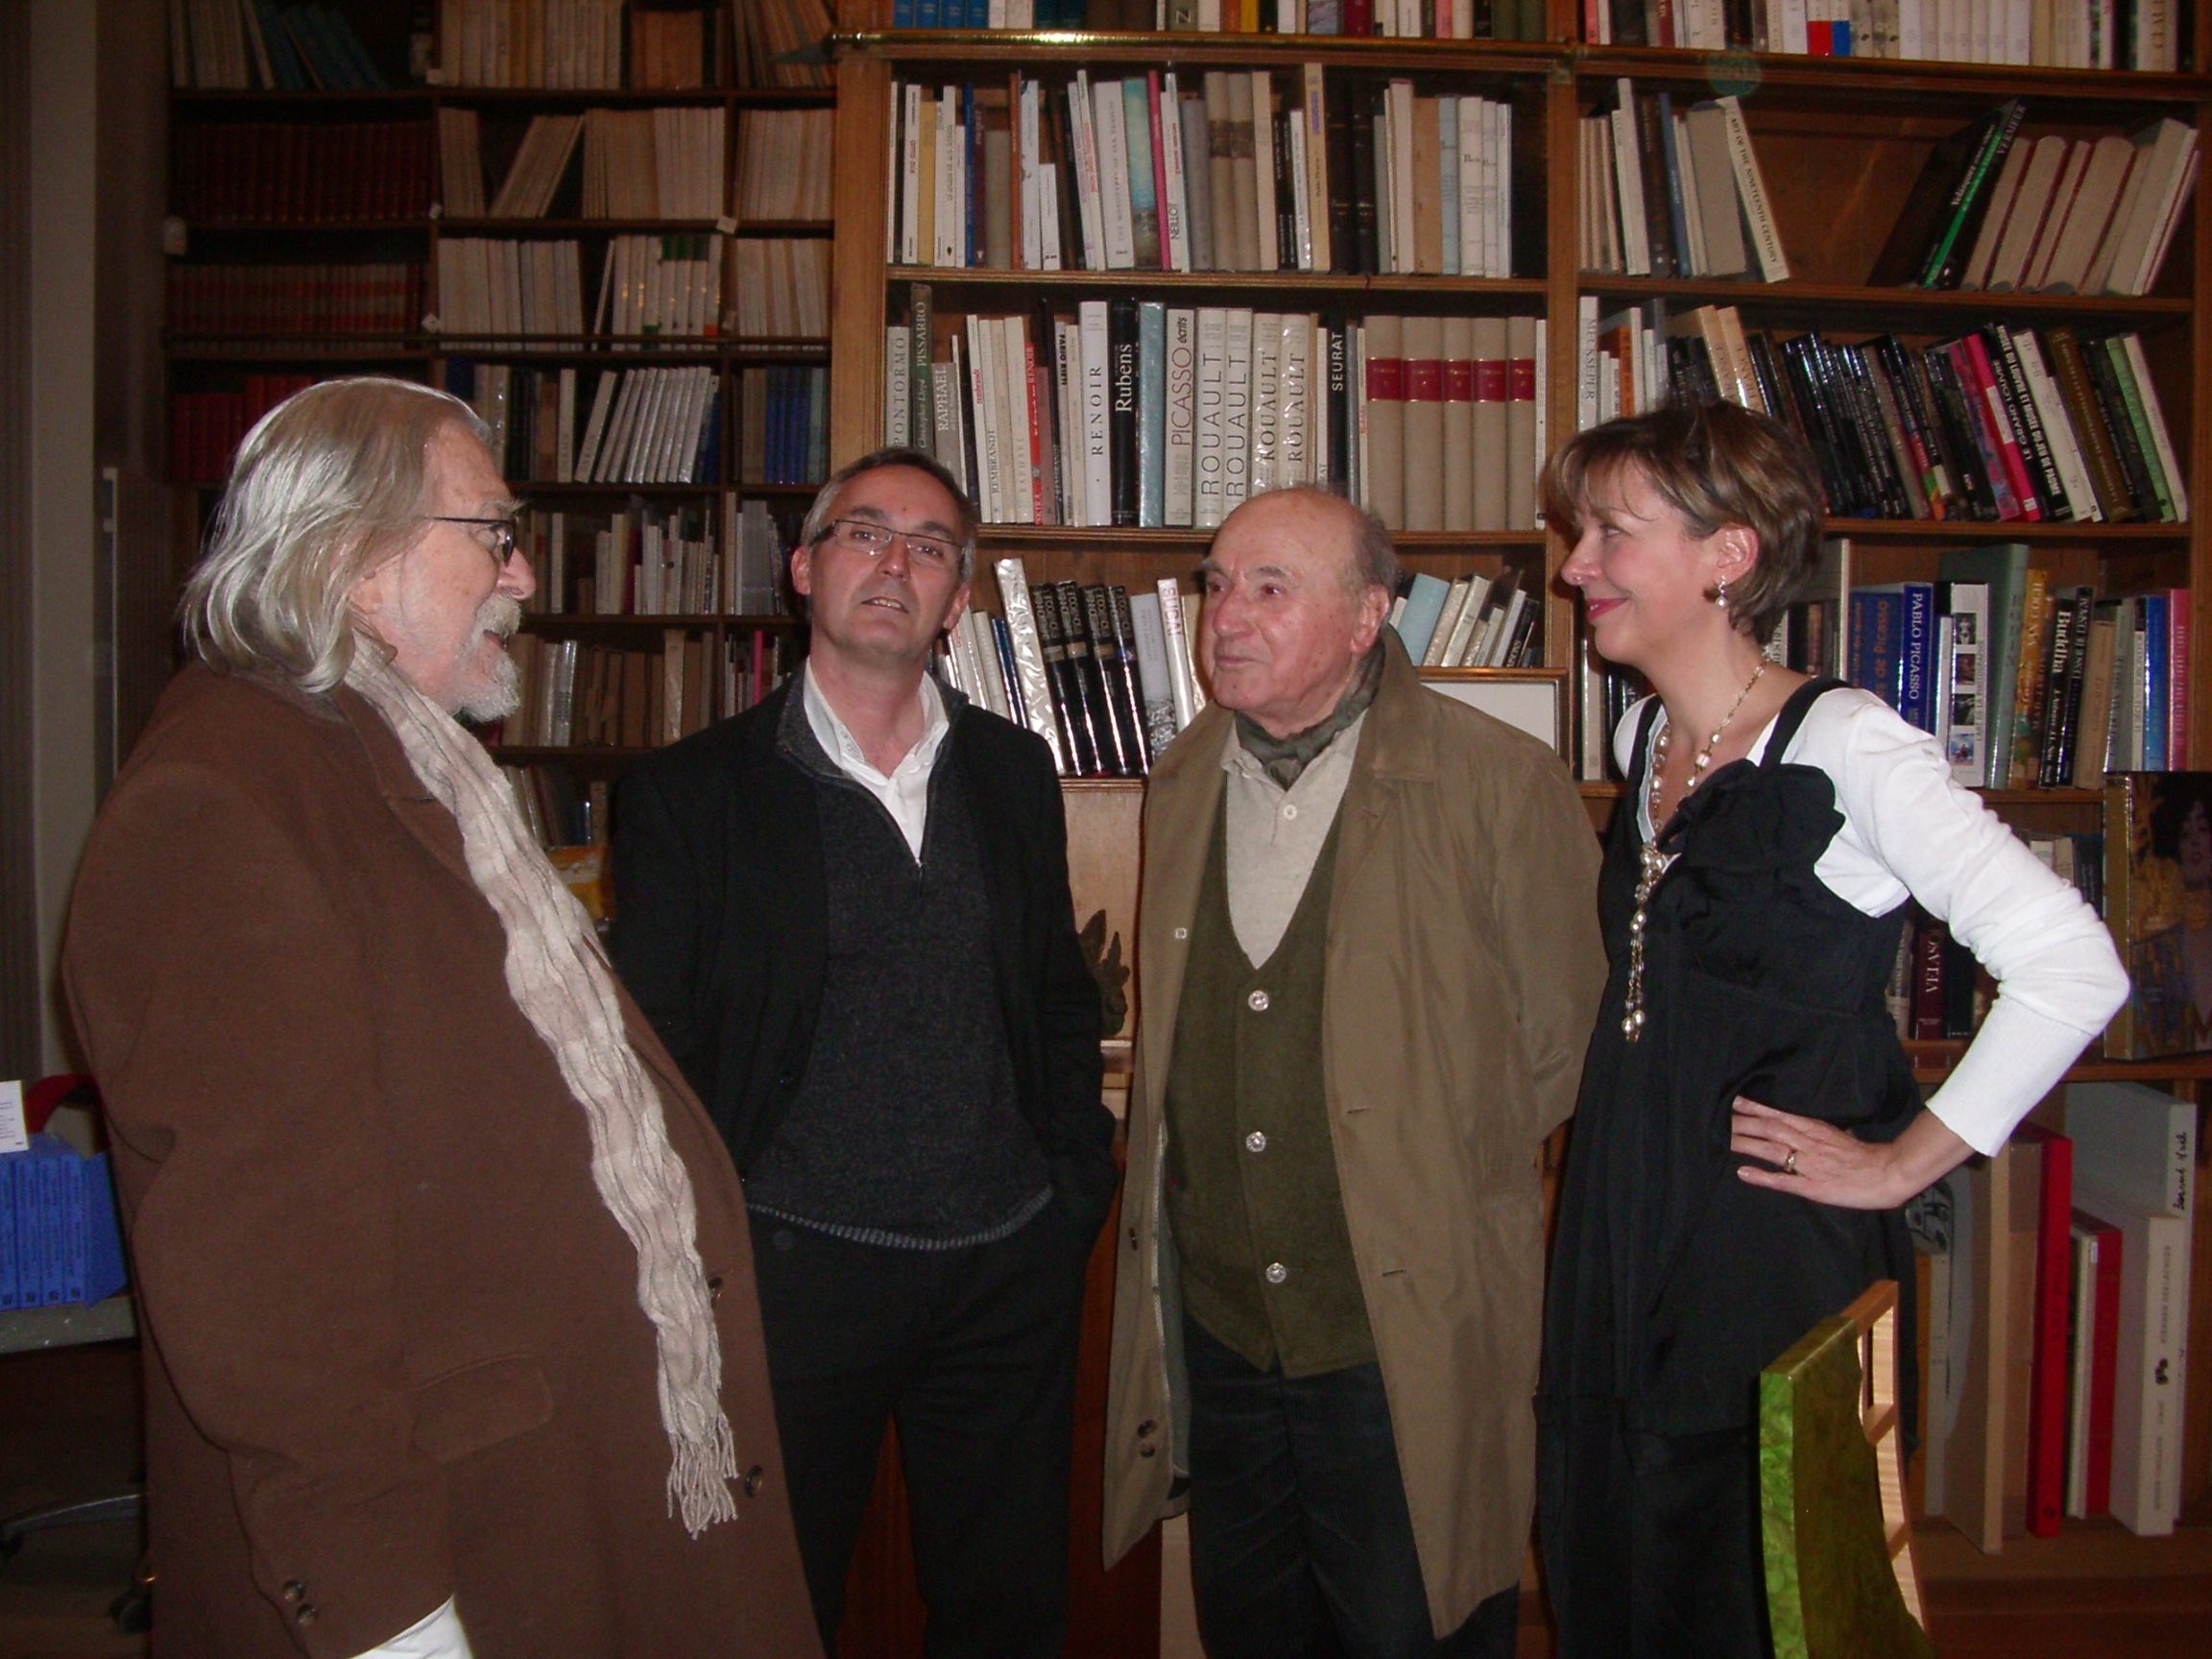 J. Guglielmi, B. Alligand, R. Marteau, FMA